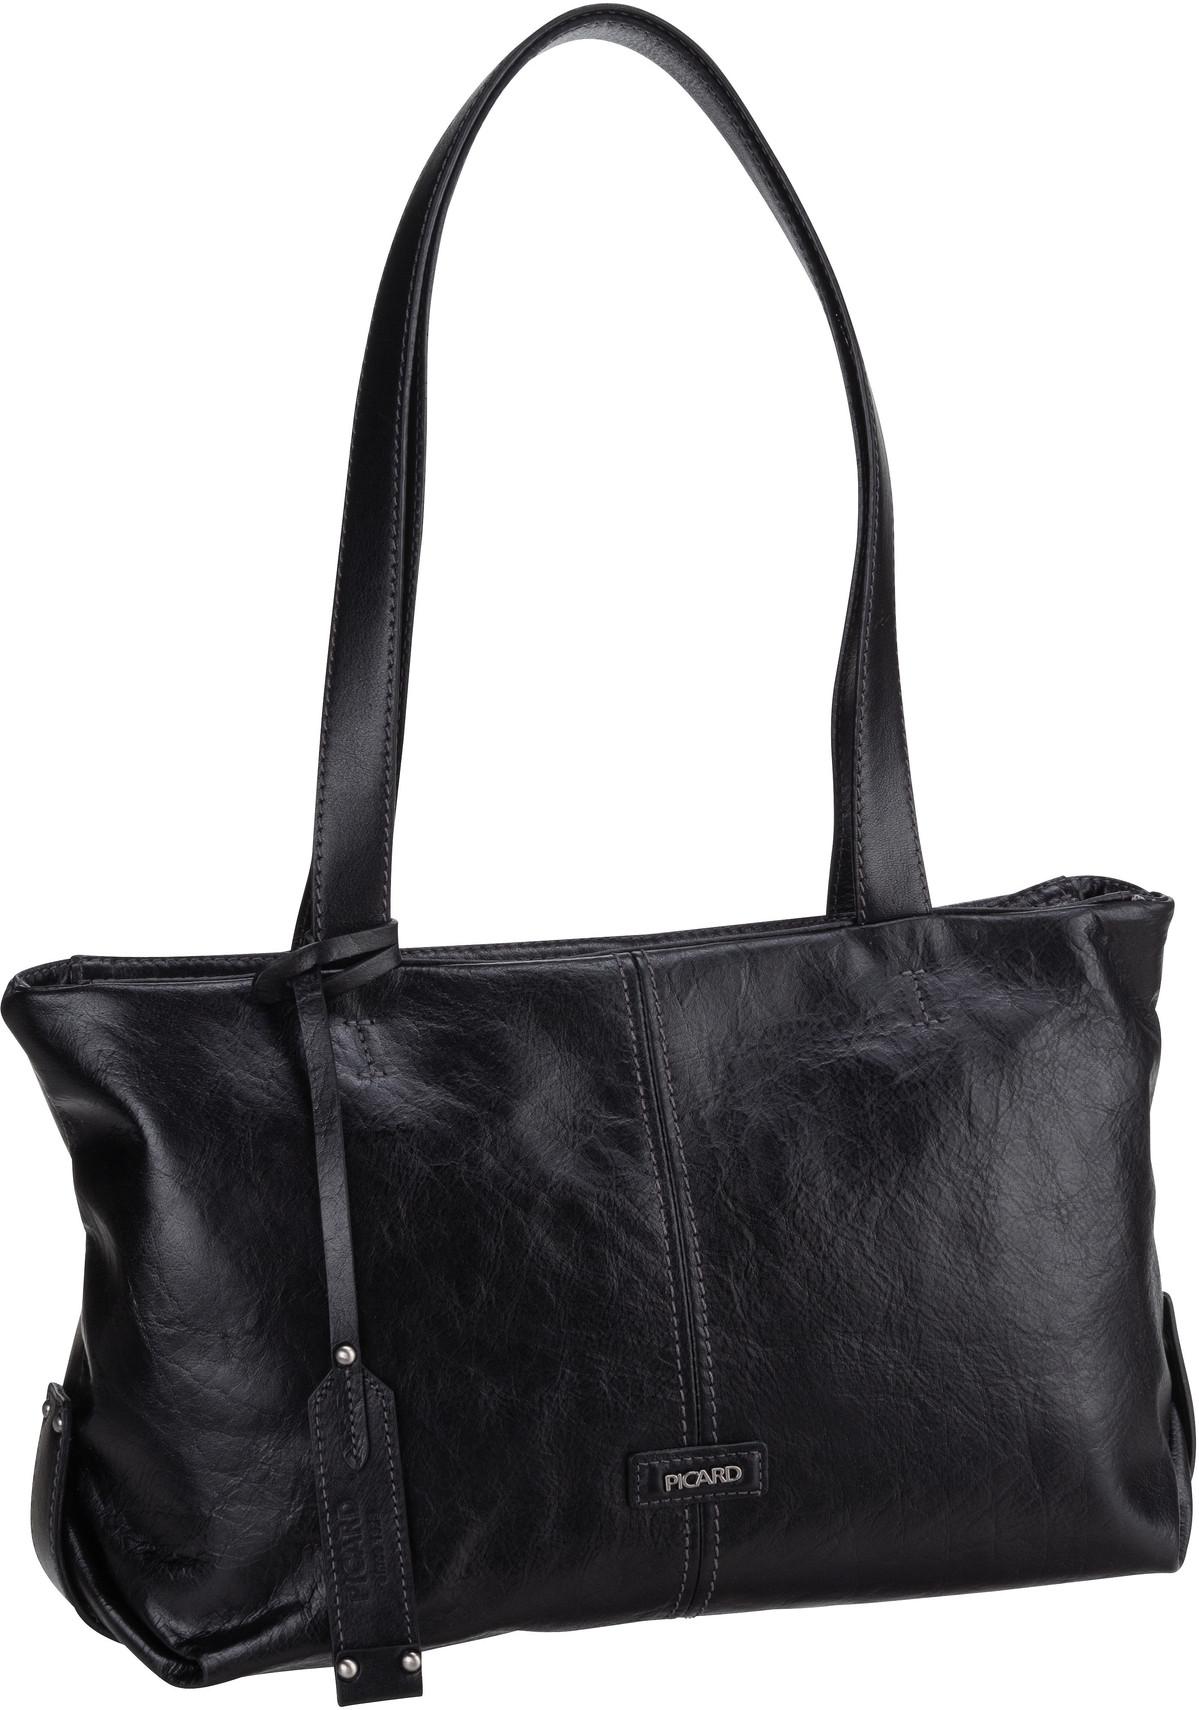 Handtasche Eternity 4956 Schwarz